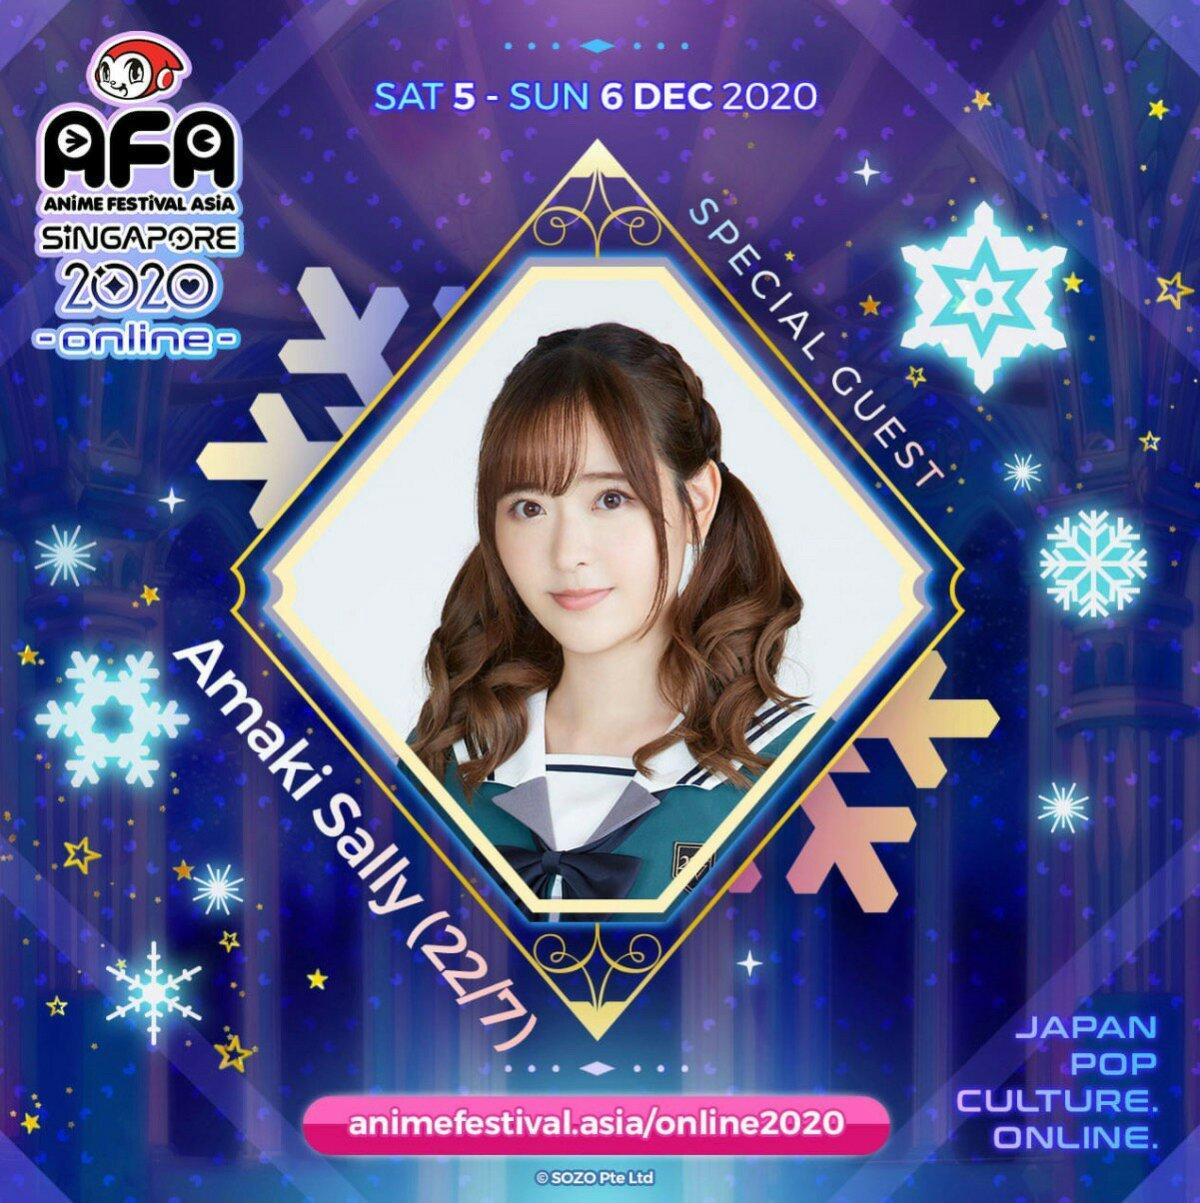 Japan Idol Group 22/7, Moona Hoshinova, Ayaka Ohashi, dan Lebih Banyak Lagi Musisi & Idol Favorit Tampil di Stage Virtual AFA! 4